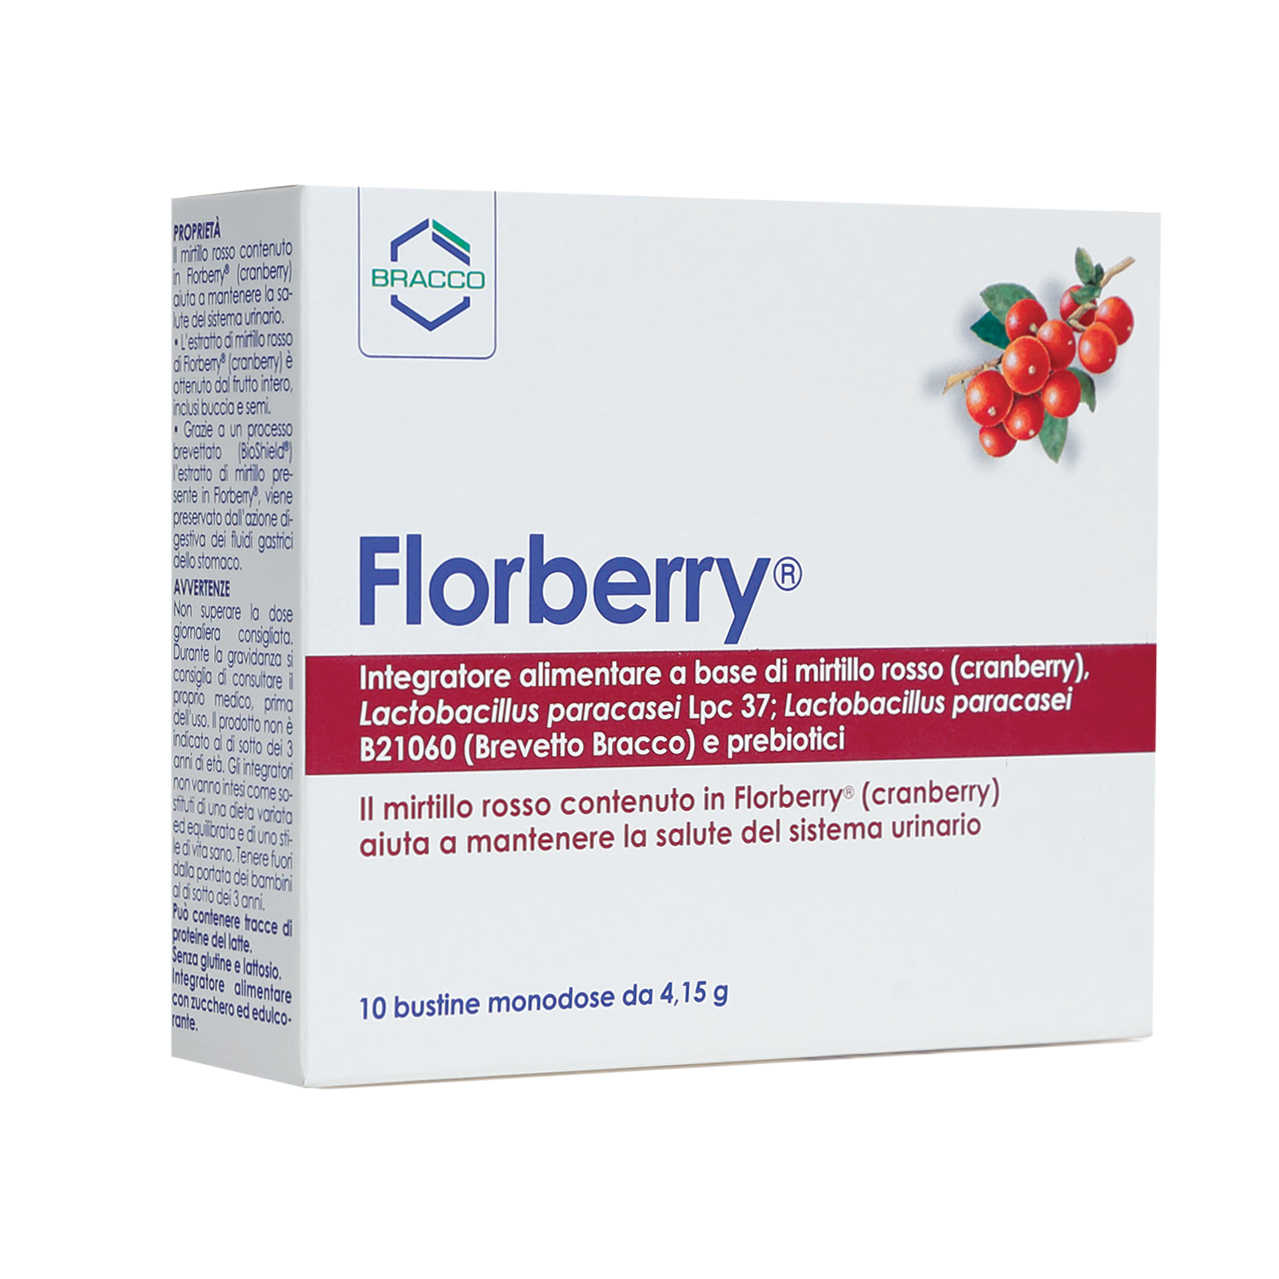 Florberry - Bustine Monodose